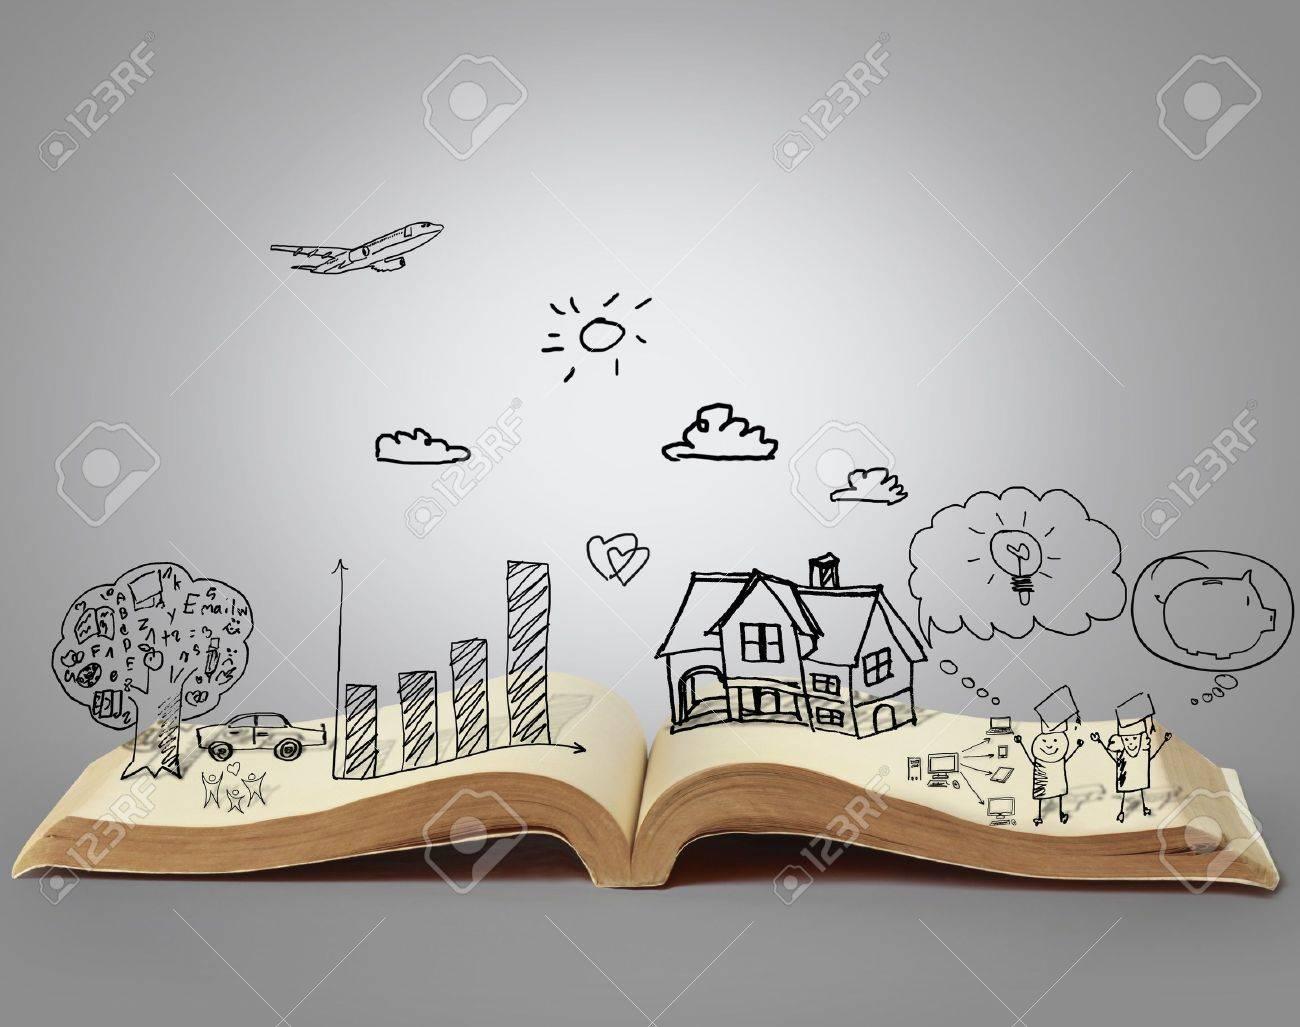 fantasy essay stories